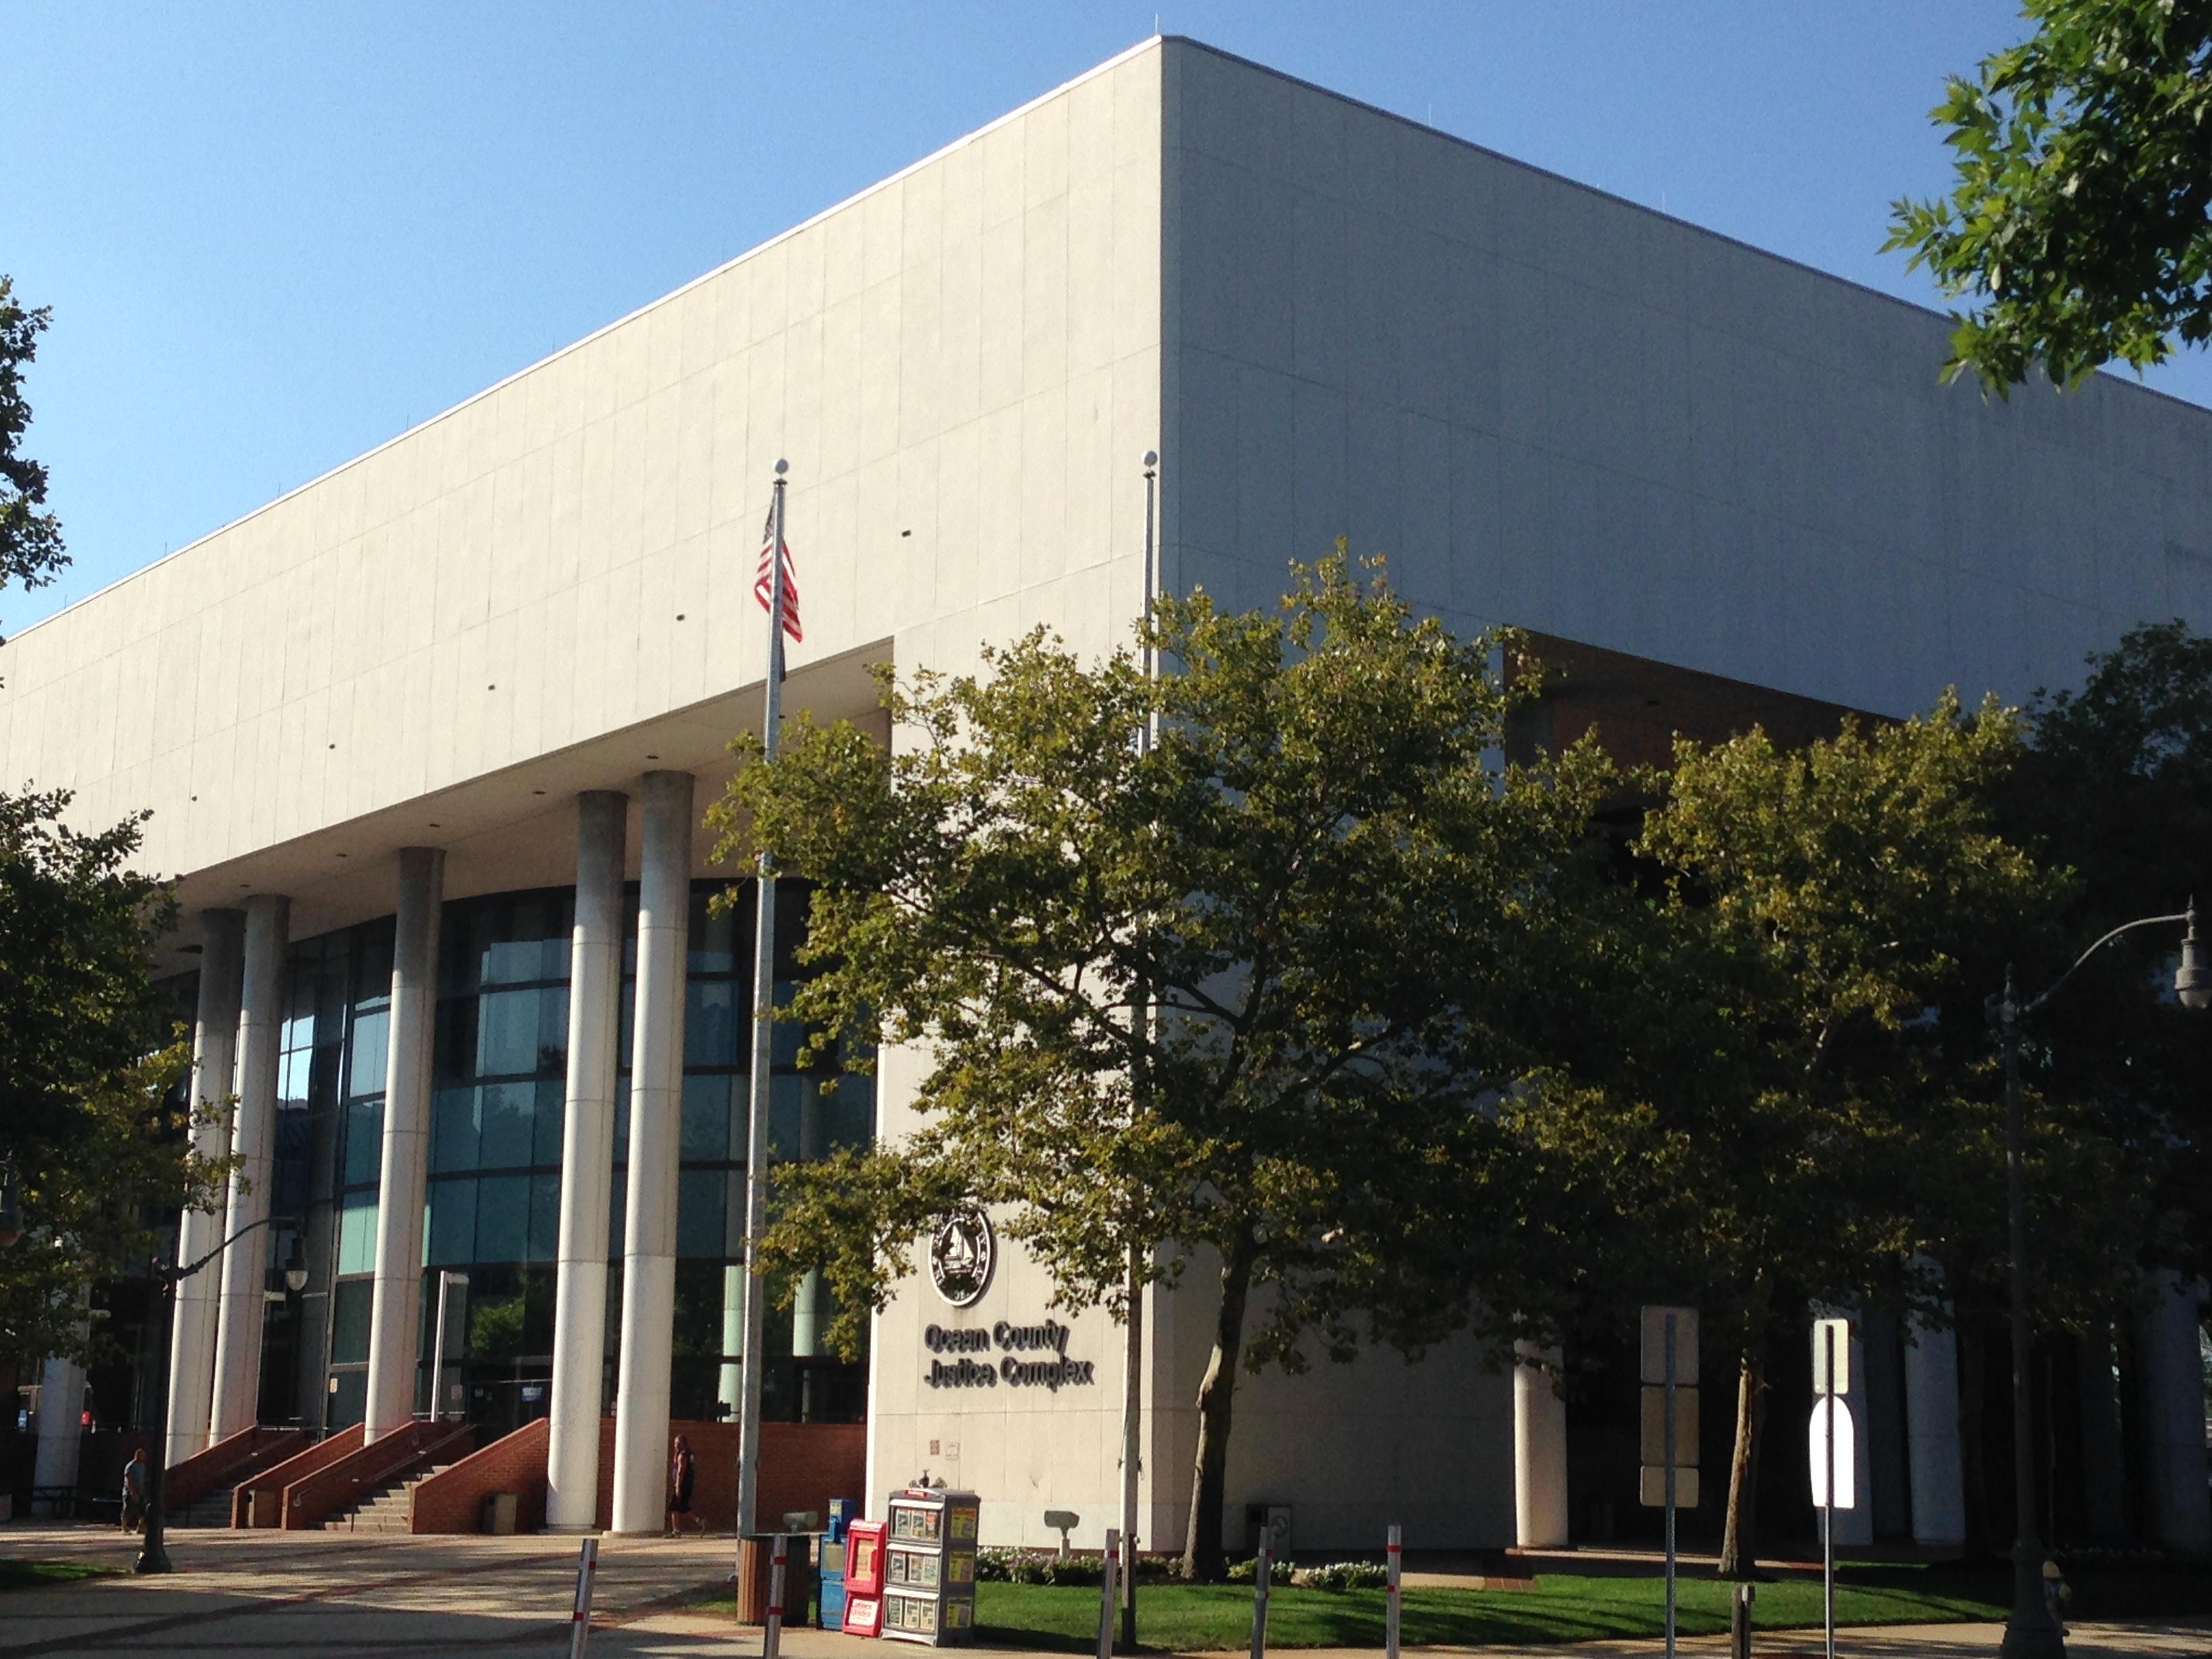 Ocean County Justice Complex (Photo: Daniel Nee)